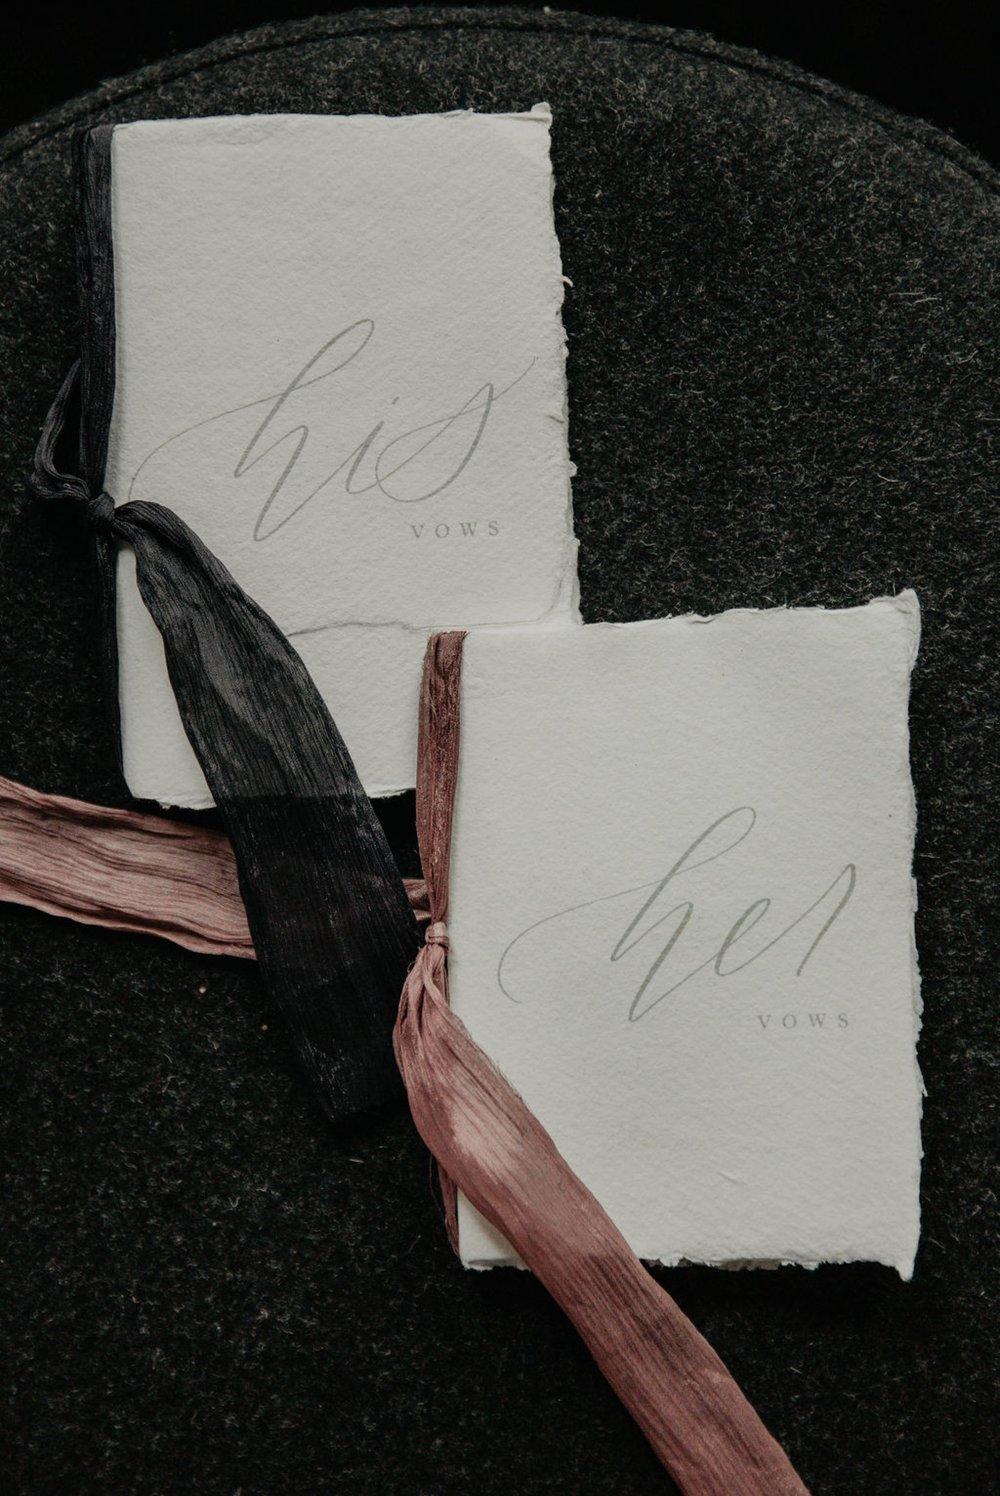 Detail shot of the wedding vow books - Matt Smarsh and Johanna Dye - Raleigh North Carolina Urban Edgy Downtown Wedding